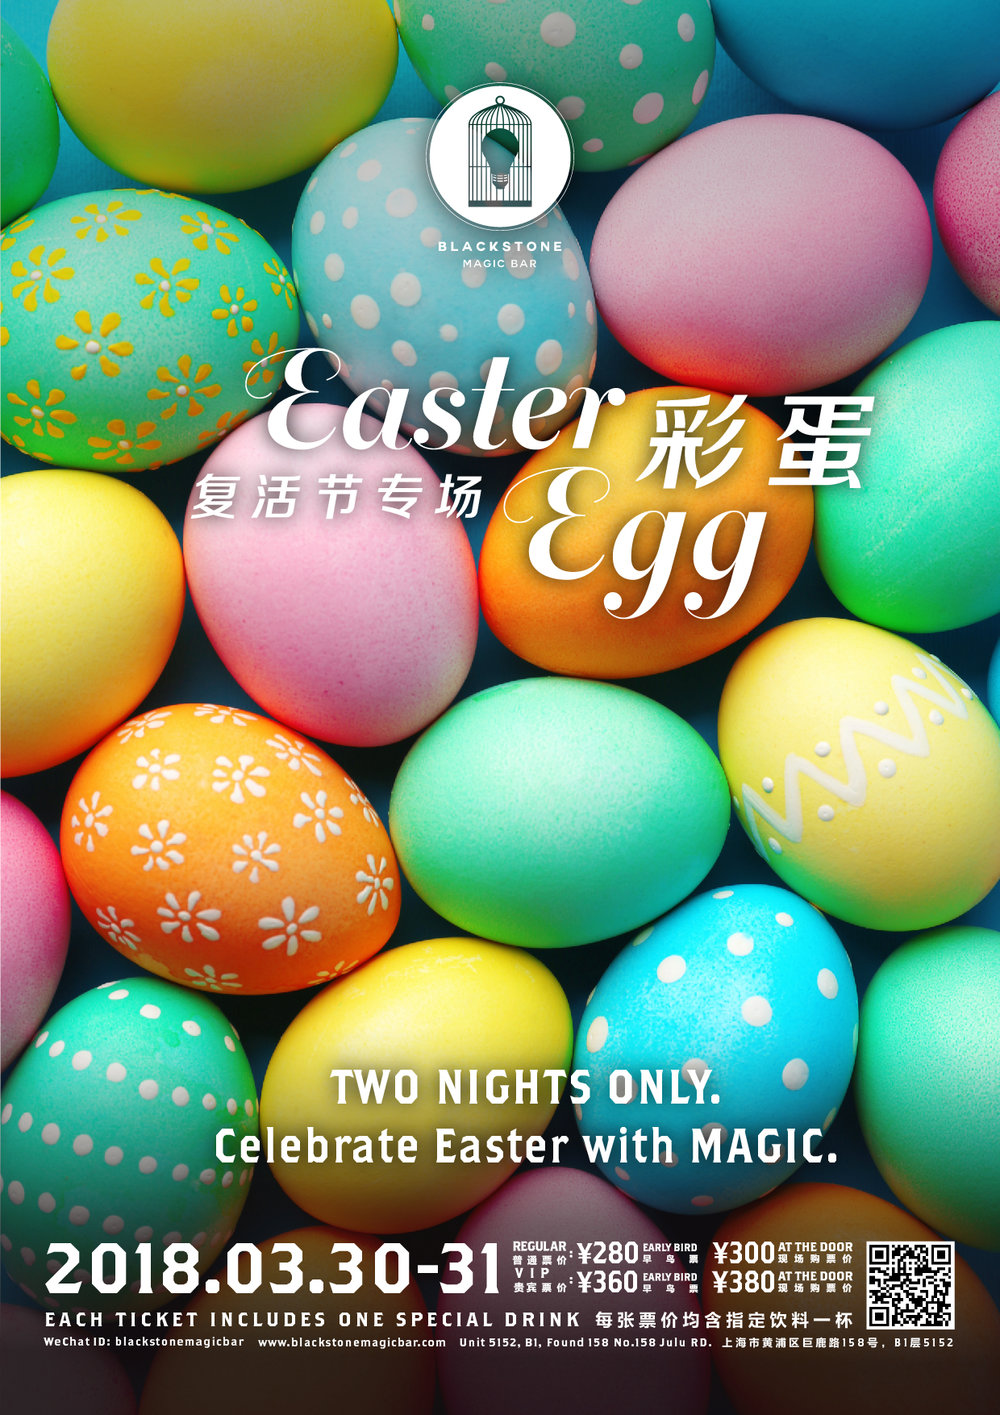 Blackstone LIVE - 复活节特别演出《Easter Egg》